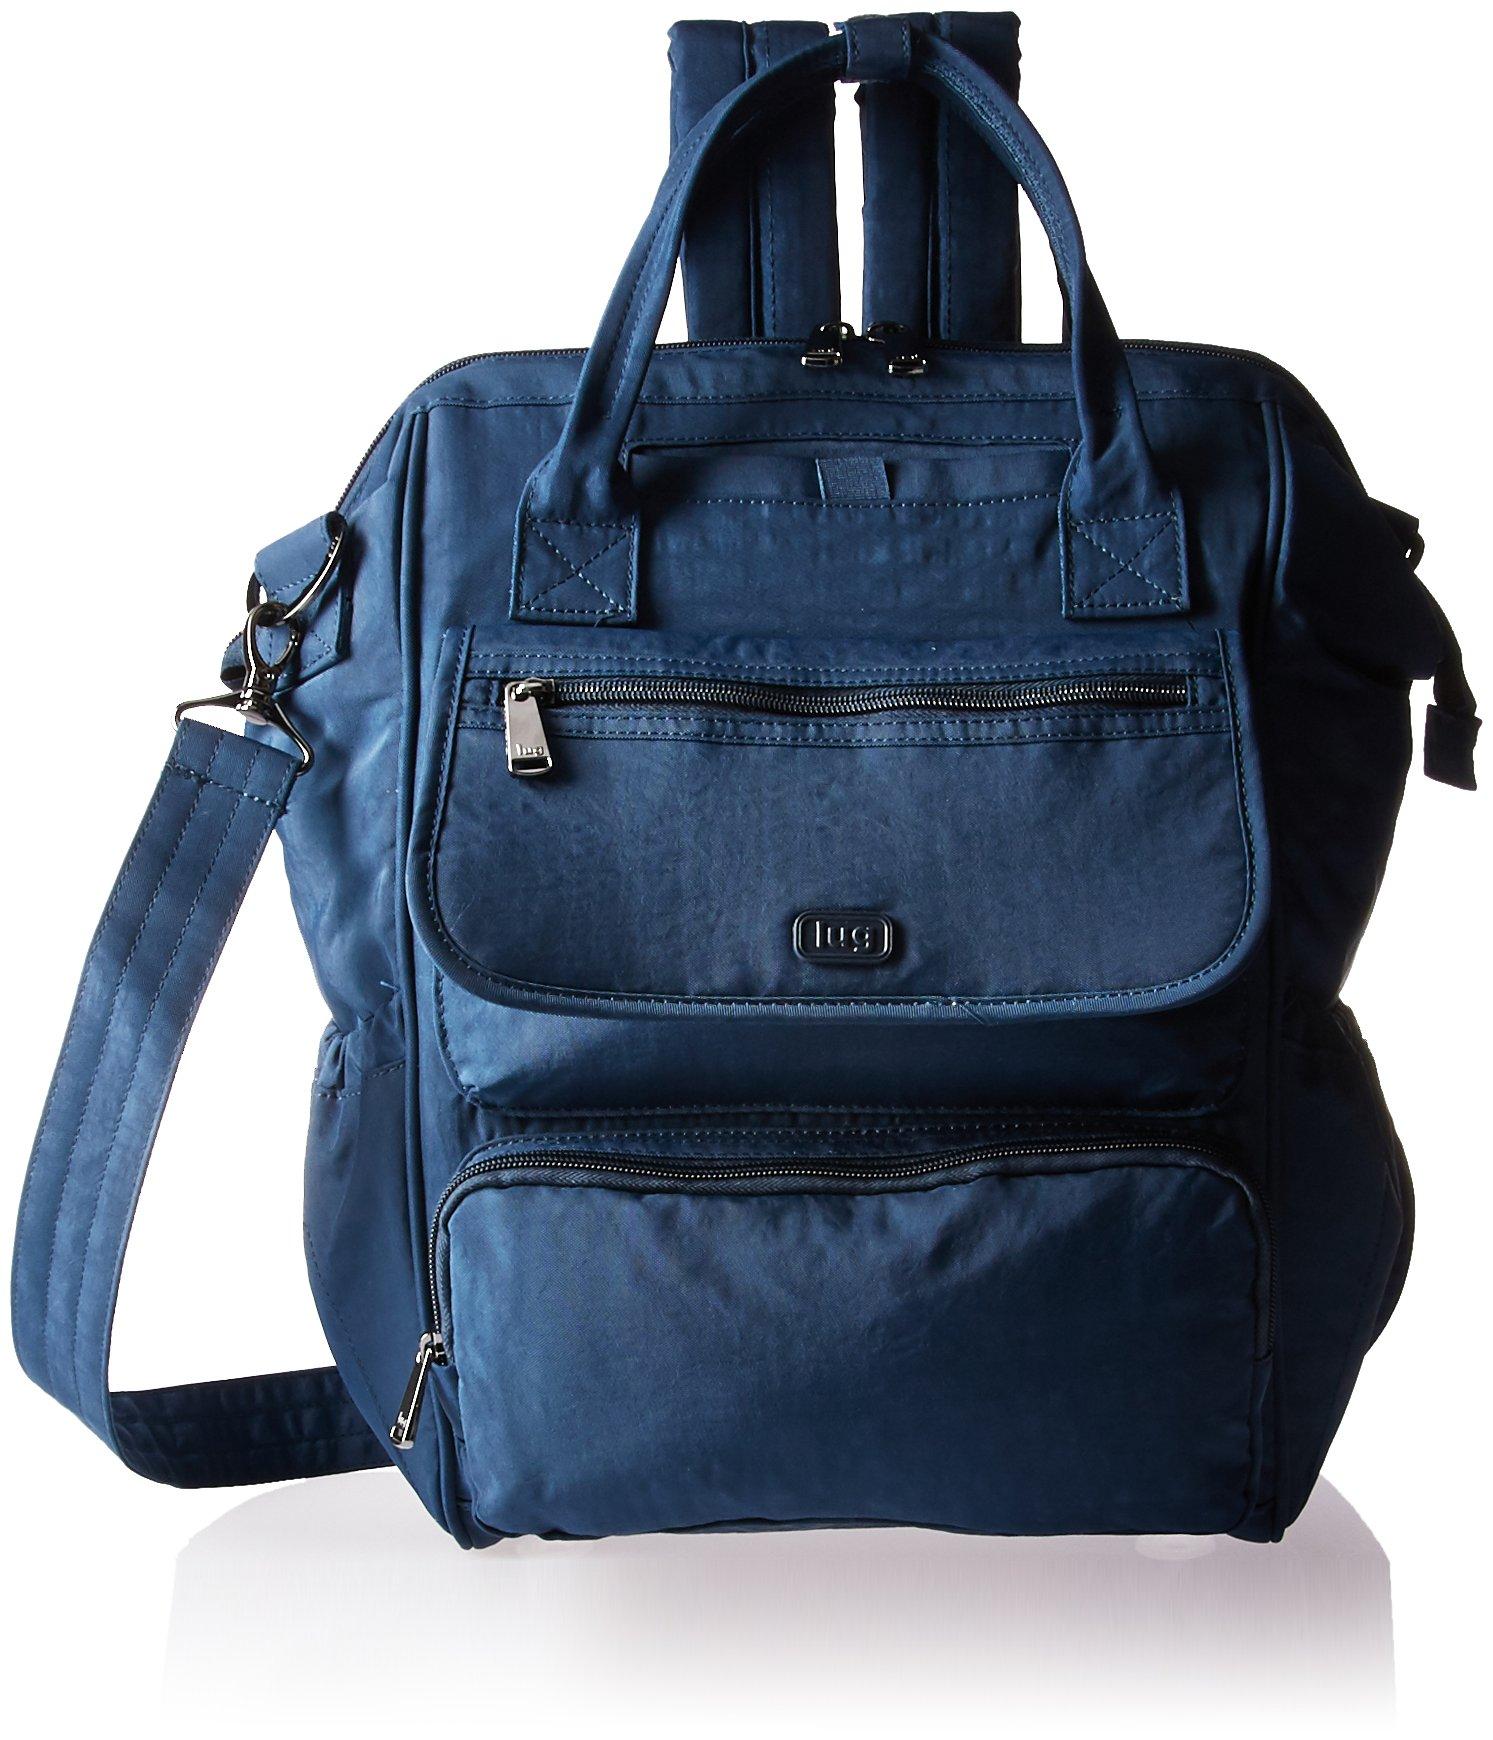 Lug Women's via Travel Tote, Navy Blue, One Size